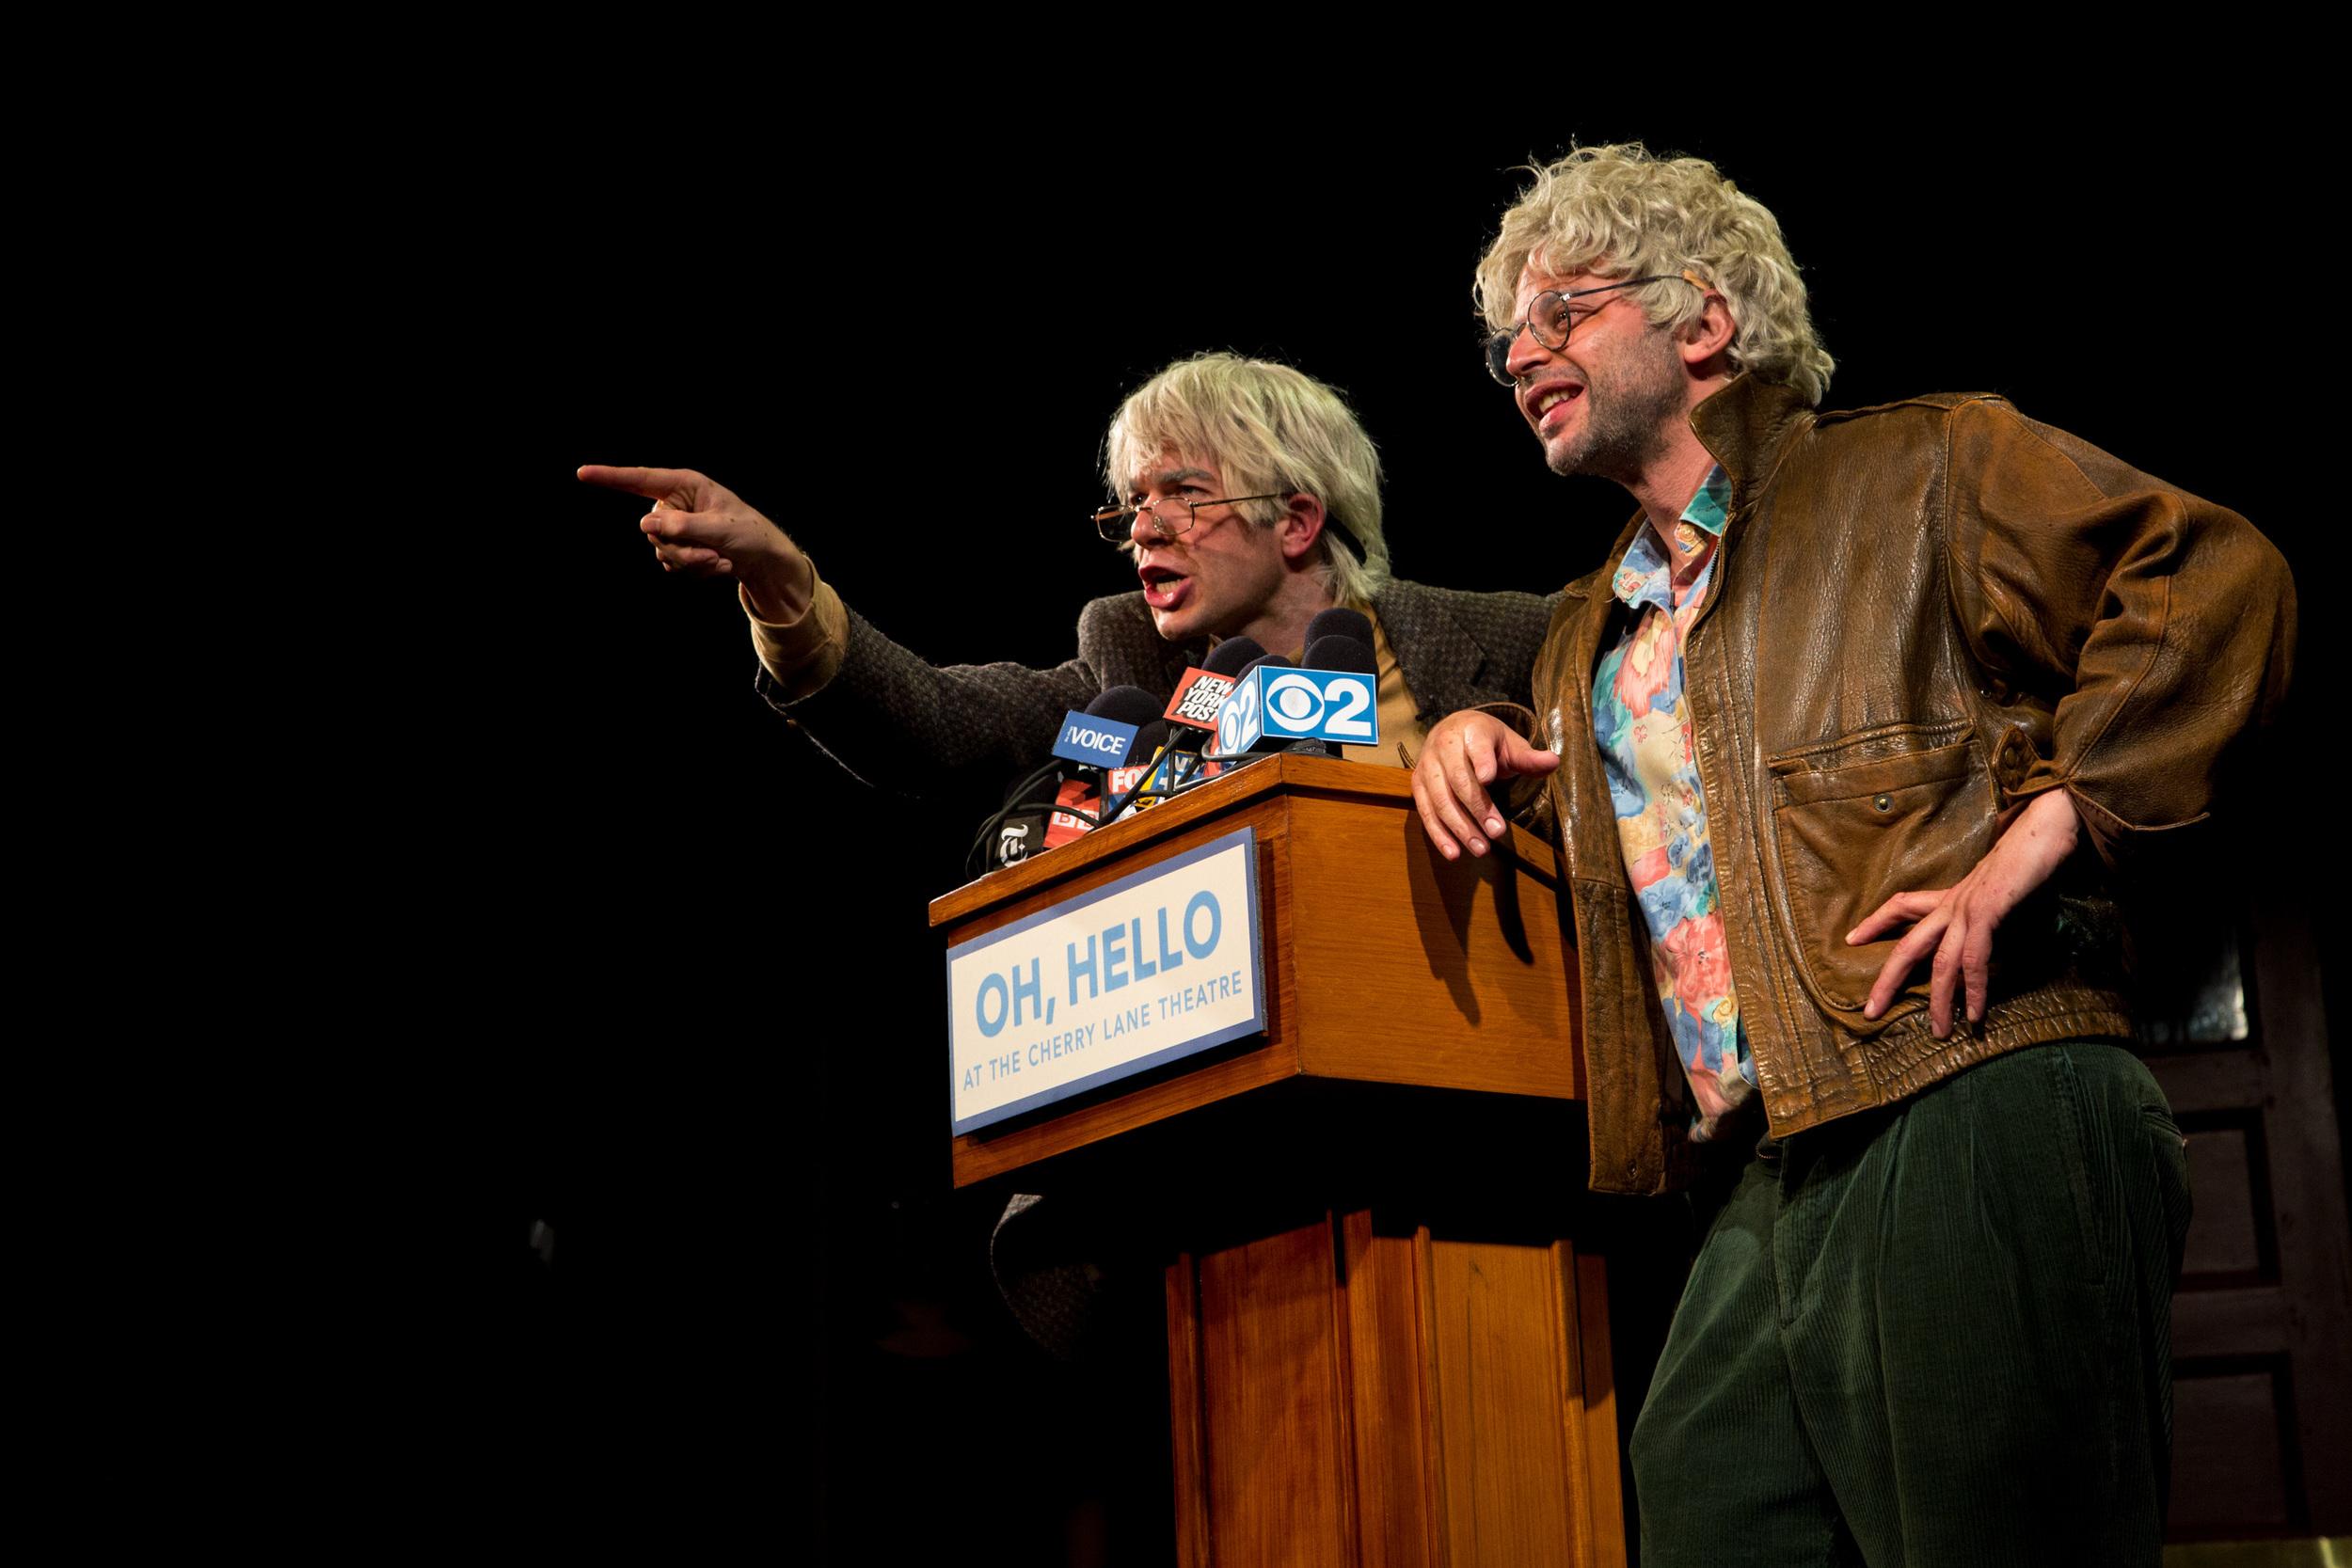 John Mulaney and Nick Kroll